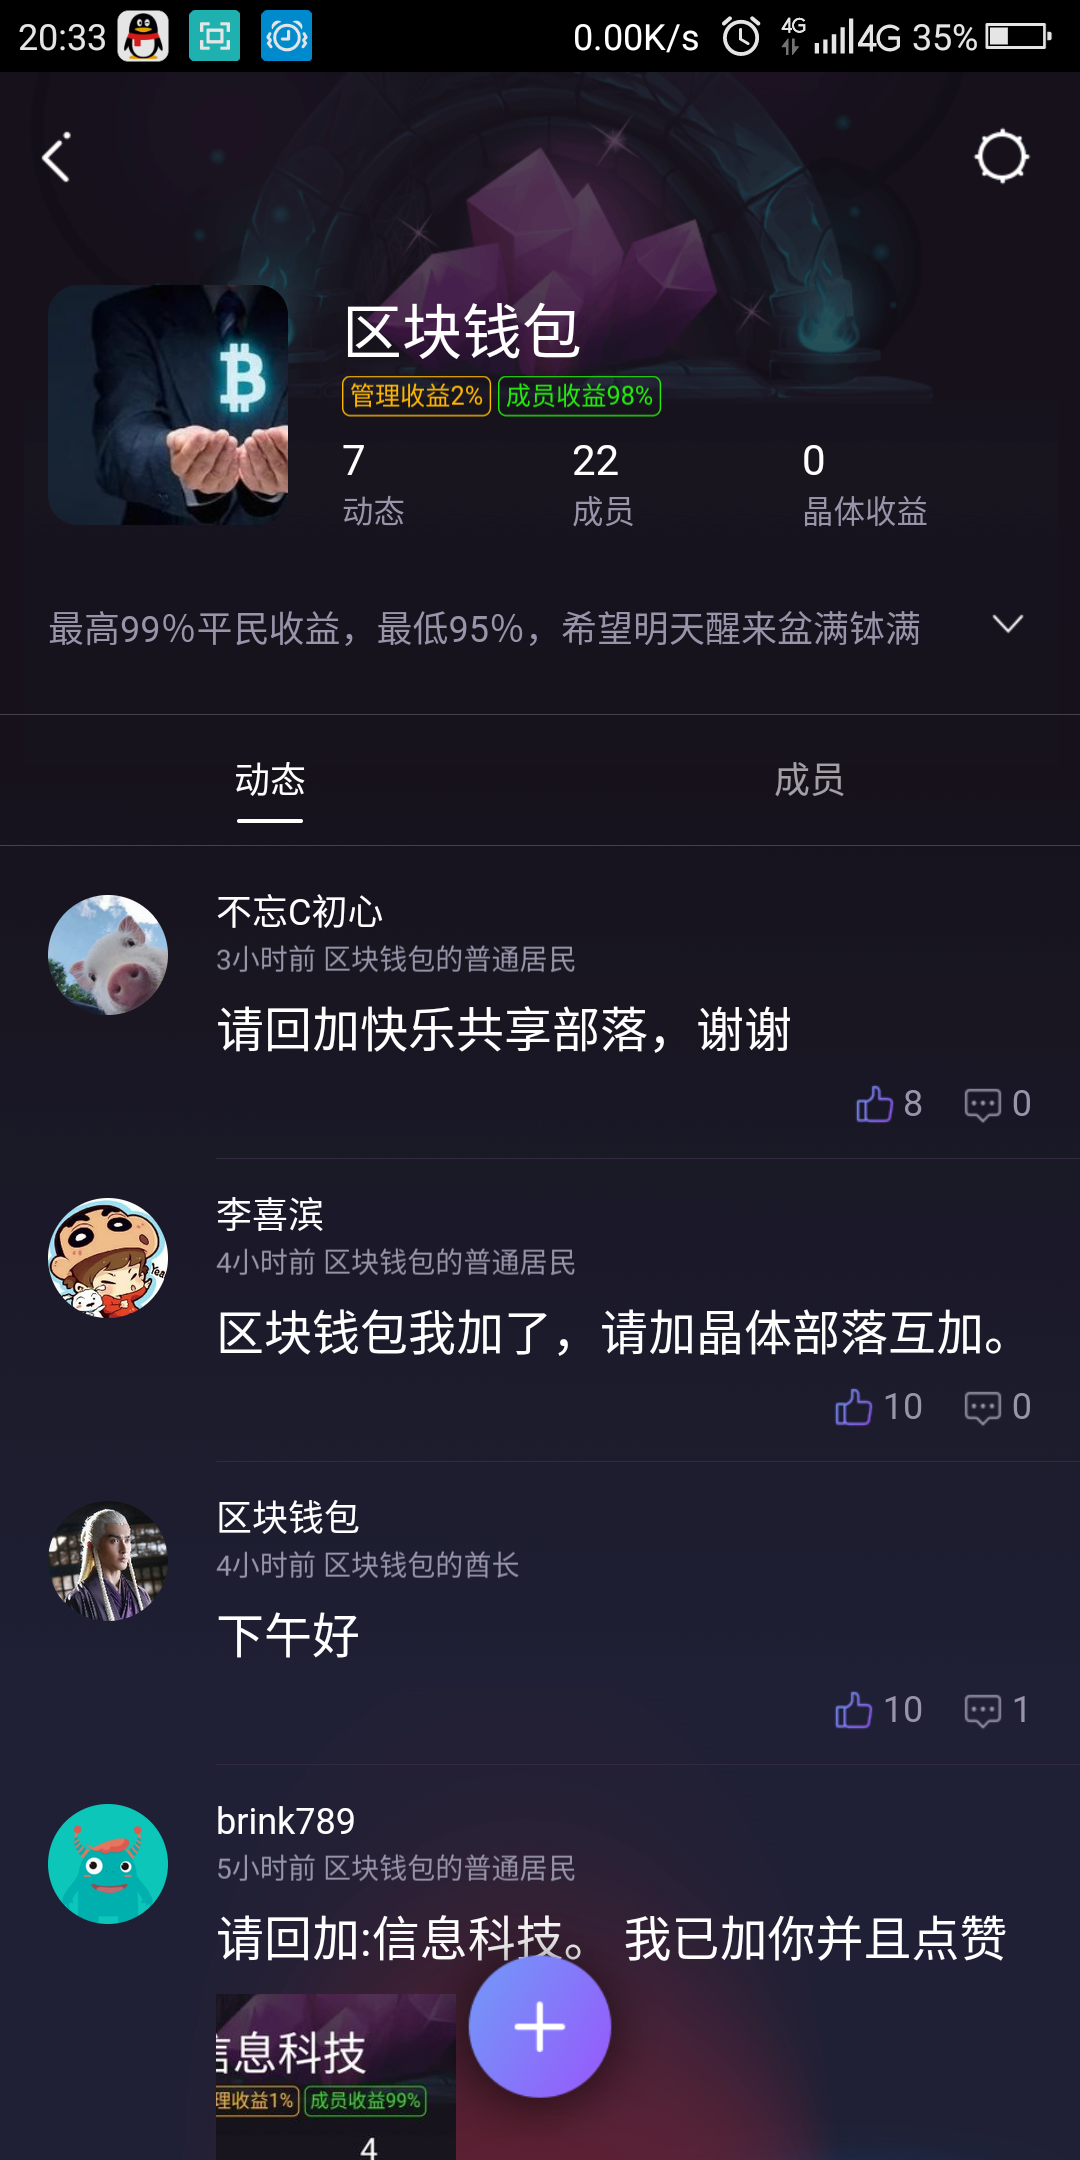 Screenshot_2018-09-29-20-33-47.png